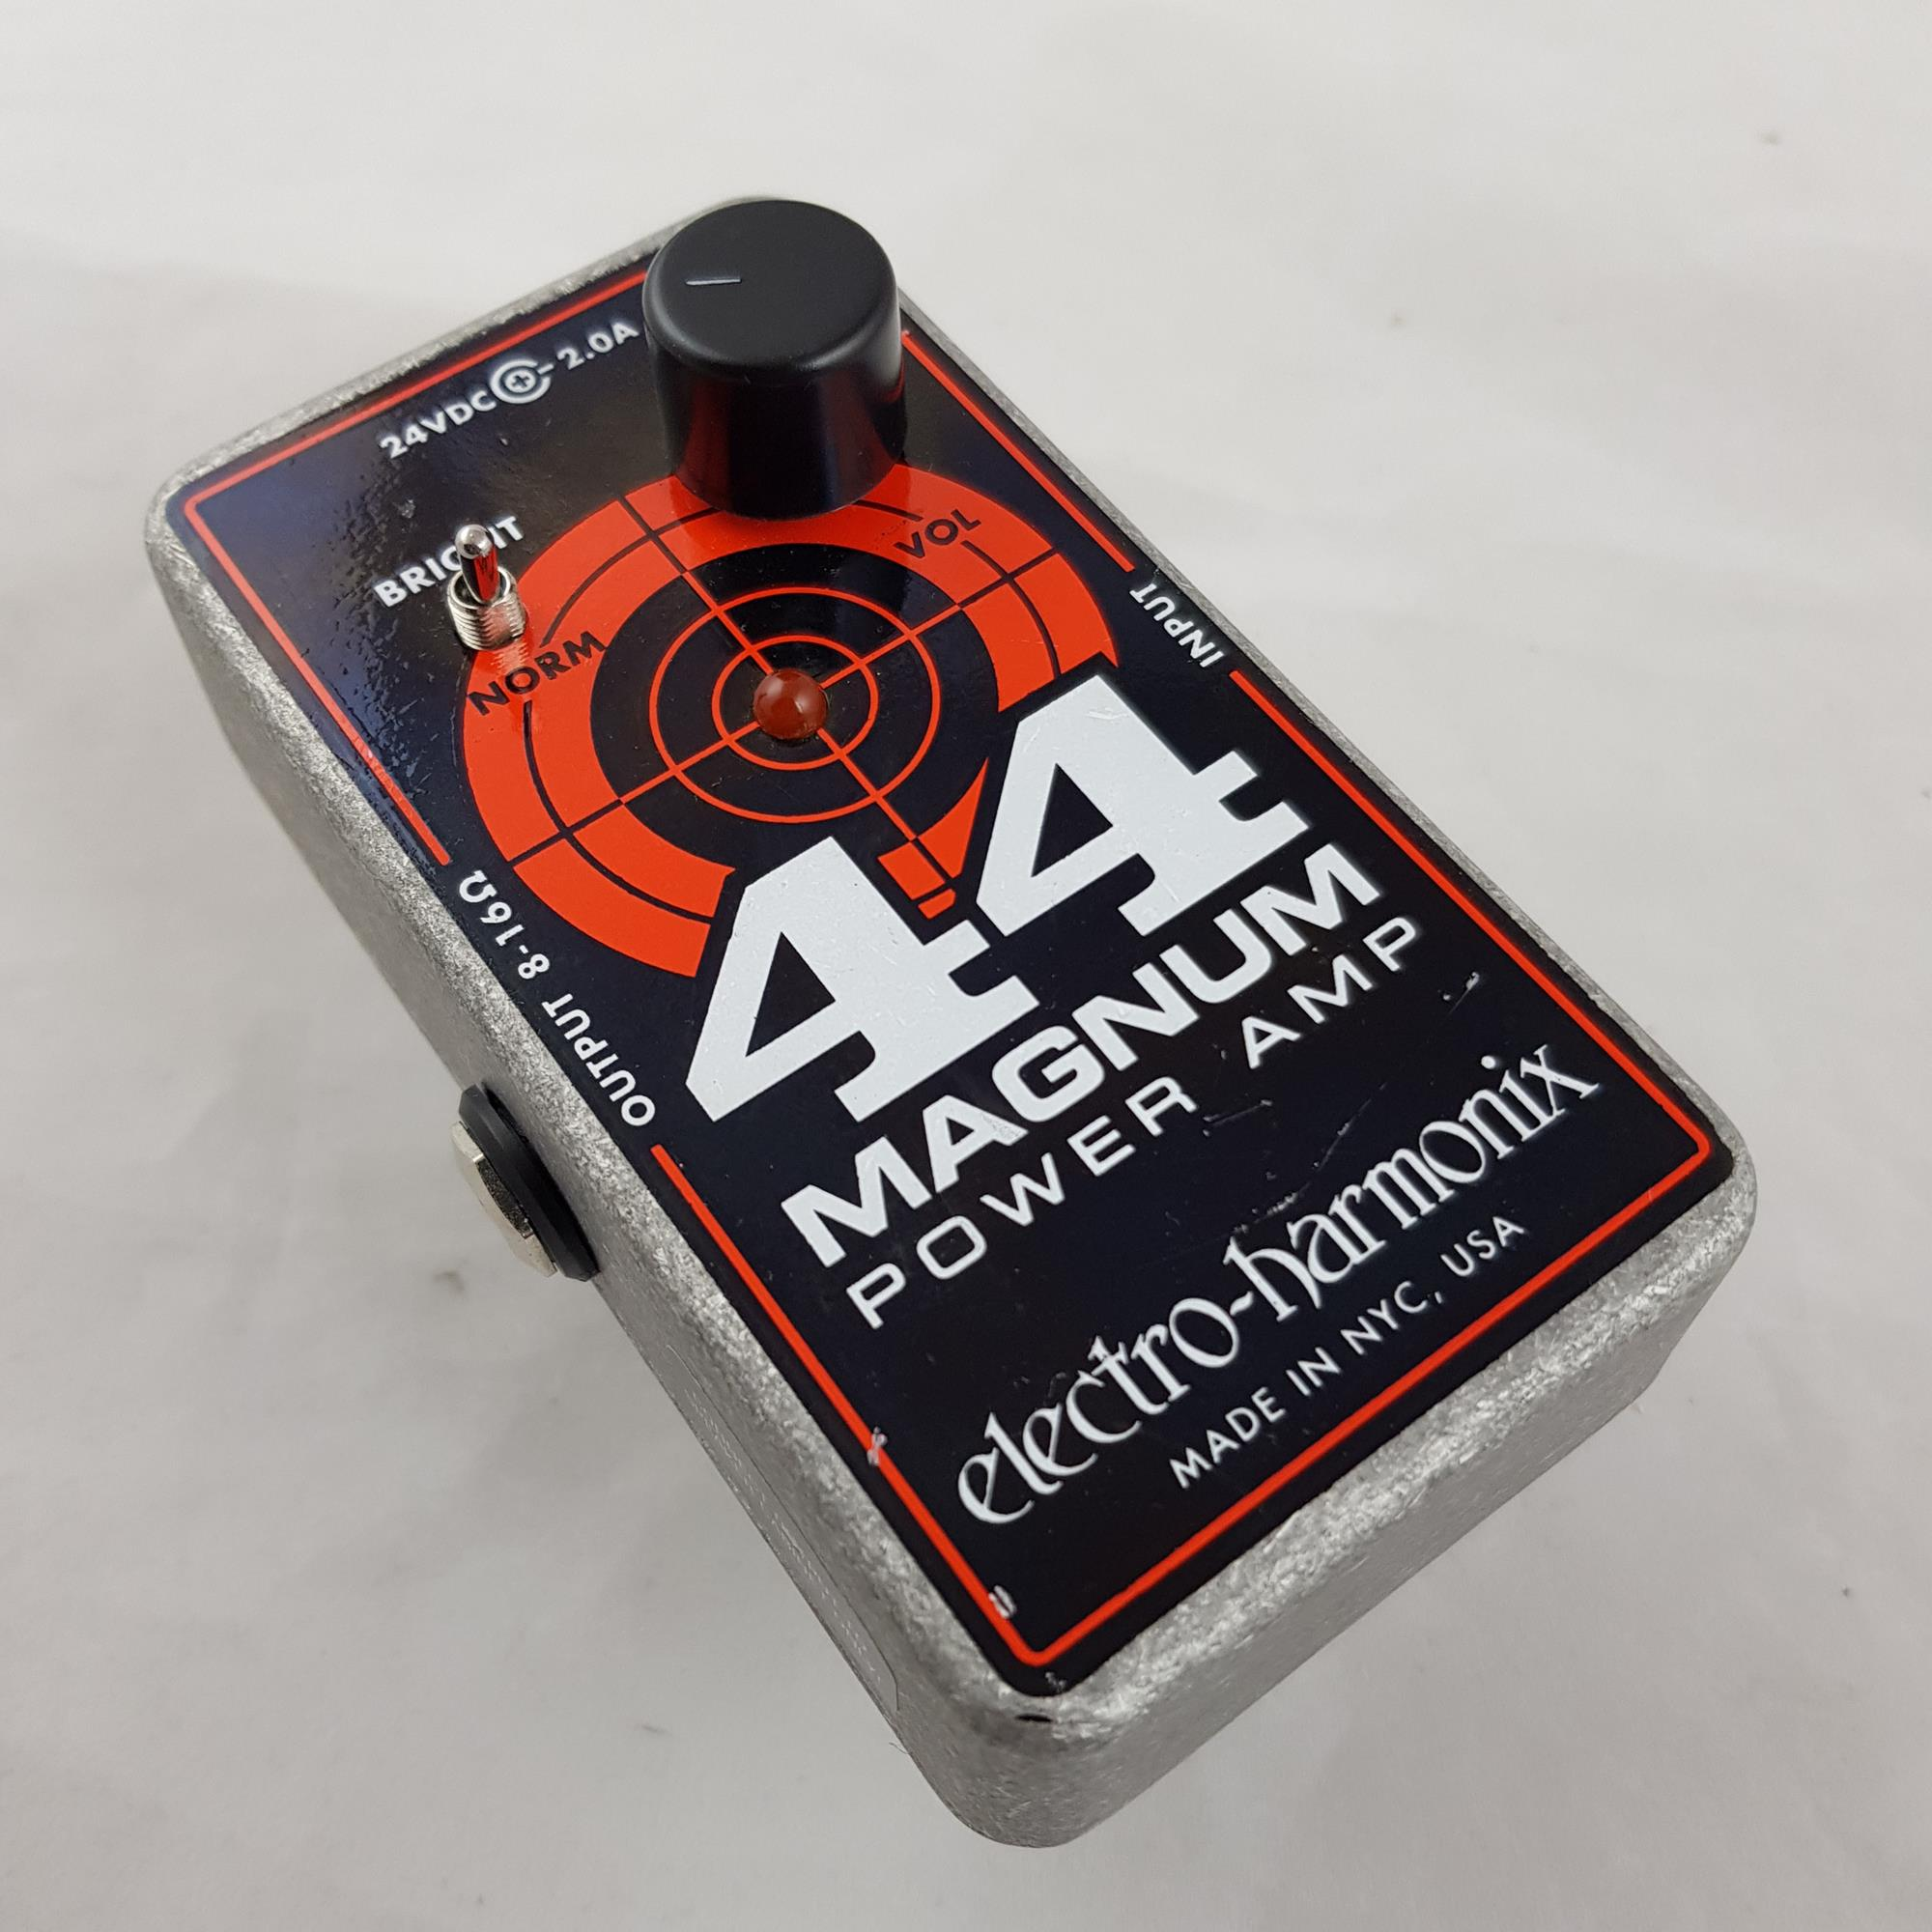 ELECTRO-HARMONIX-44-MAGNUM-sku-1610994640913